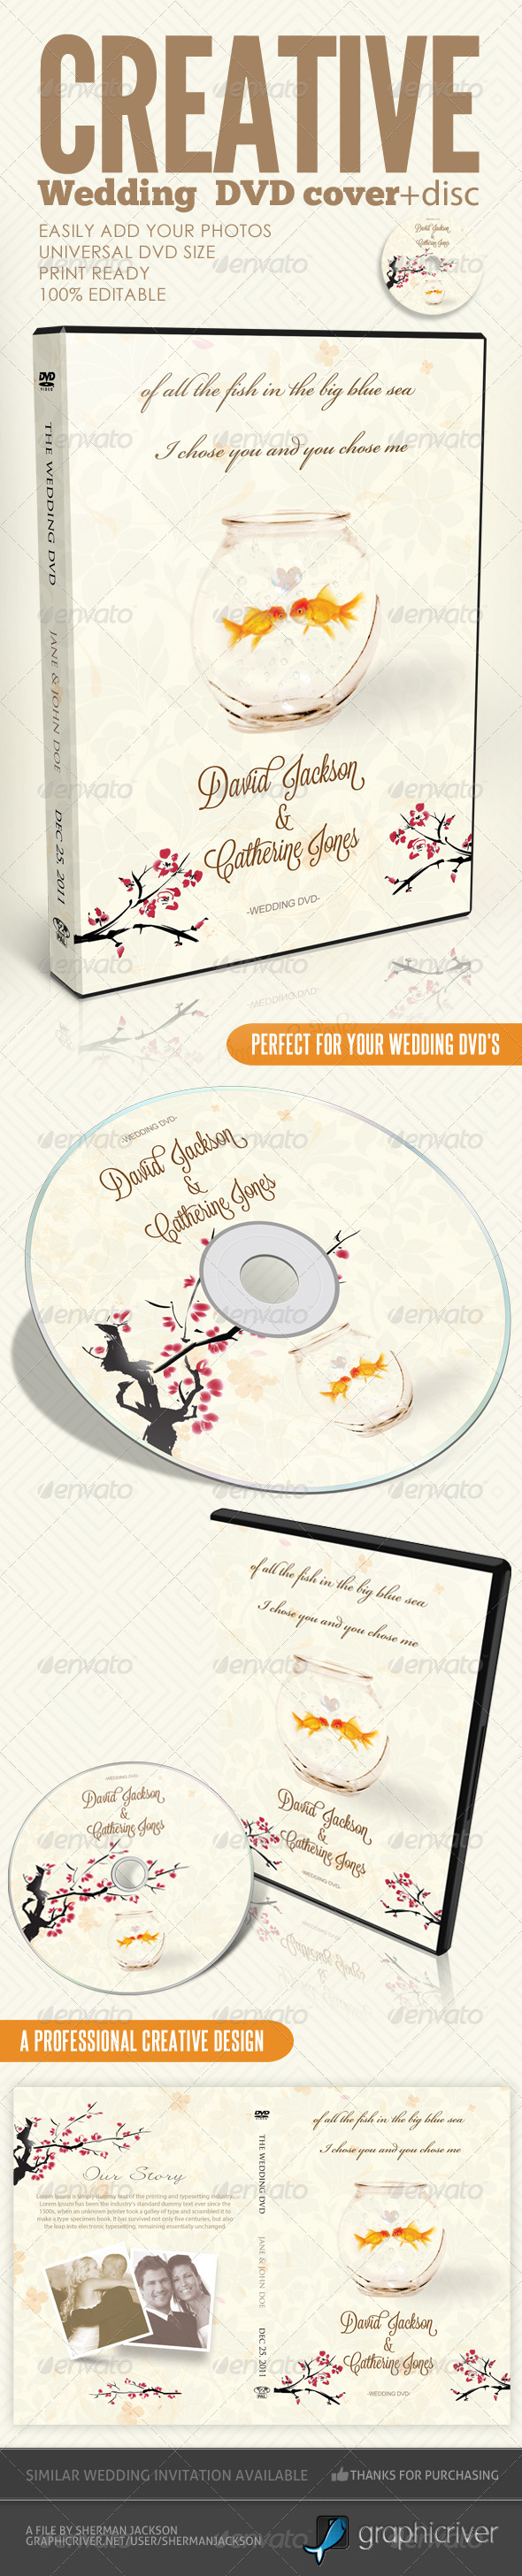 Creative wedding dvd disc label artwork psd by shermanjackson creative wedding dvd disc label artwork psd cd dvd artwork print templates stopboris Images